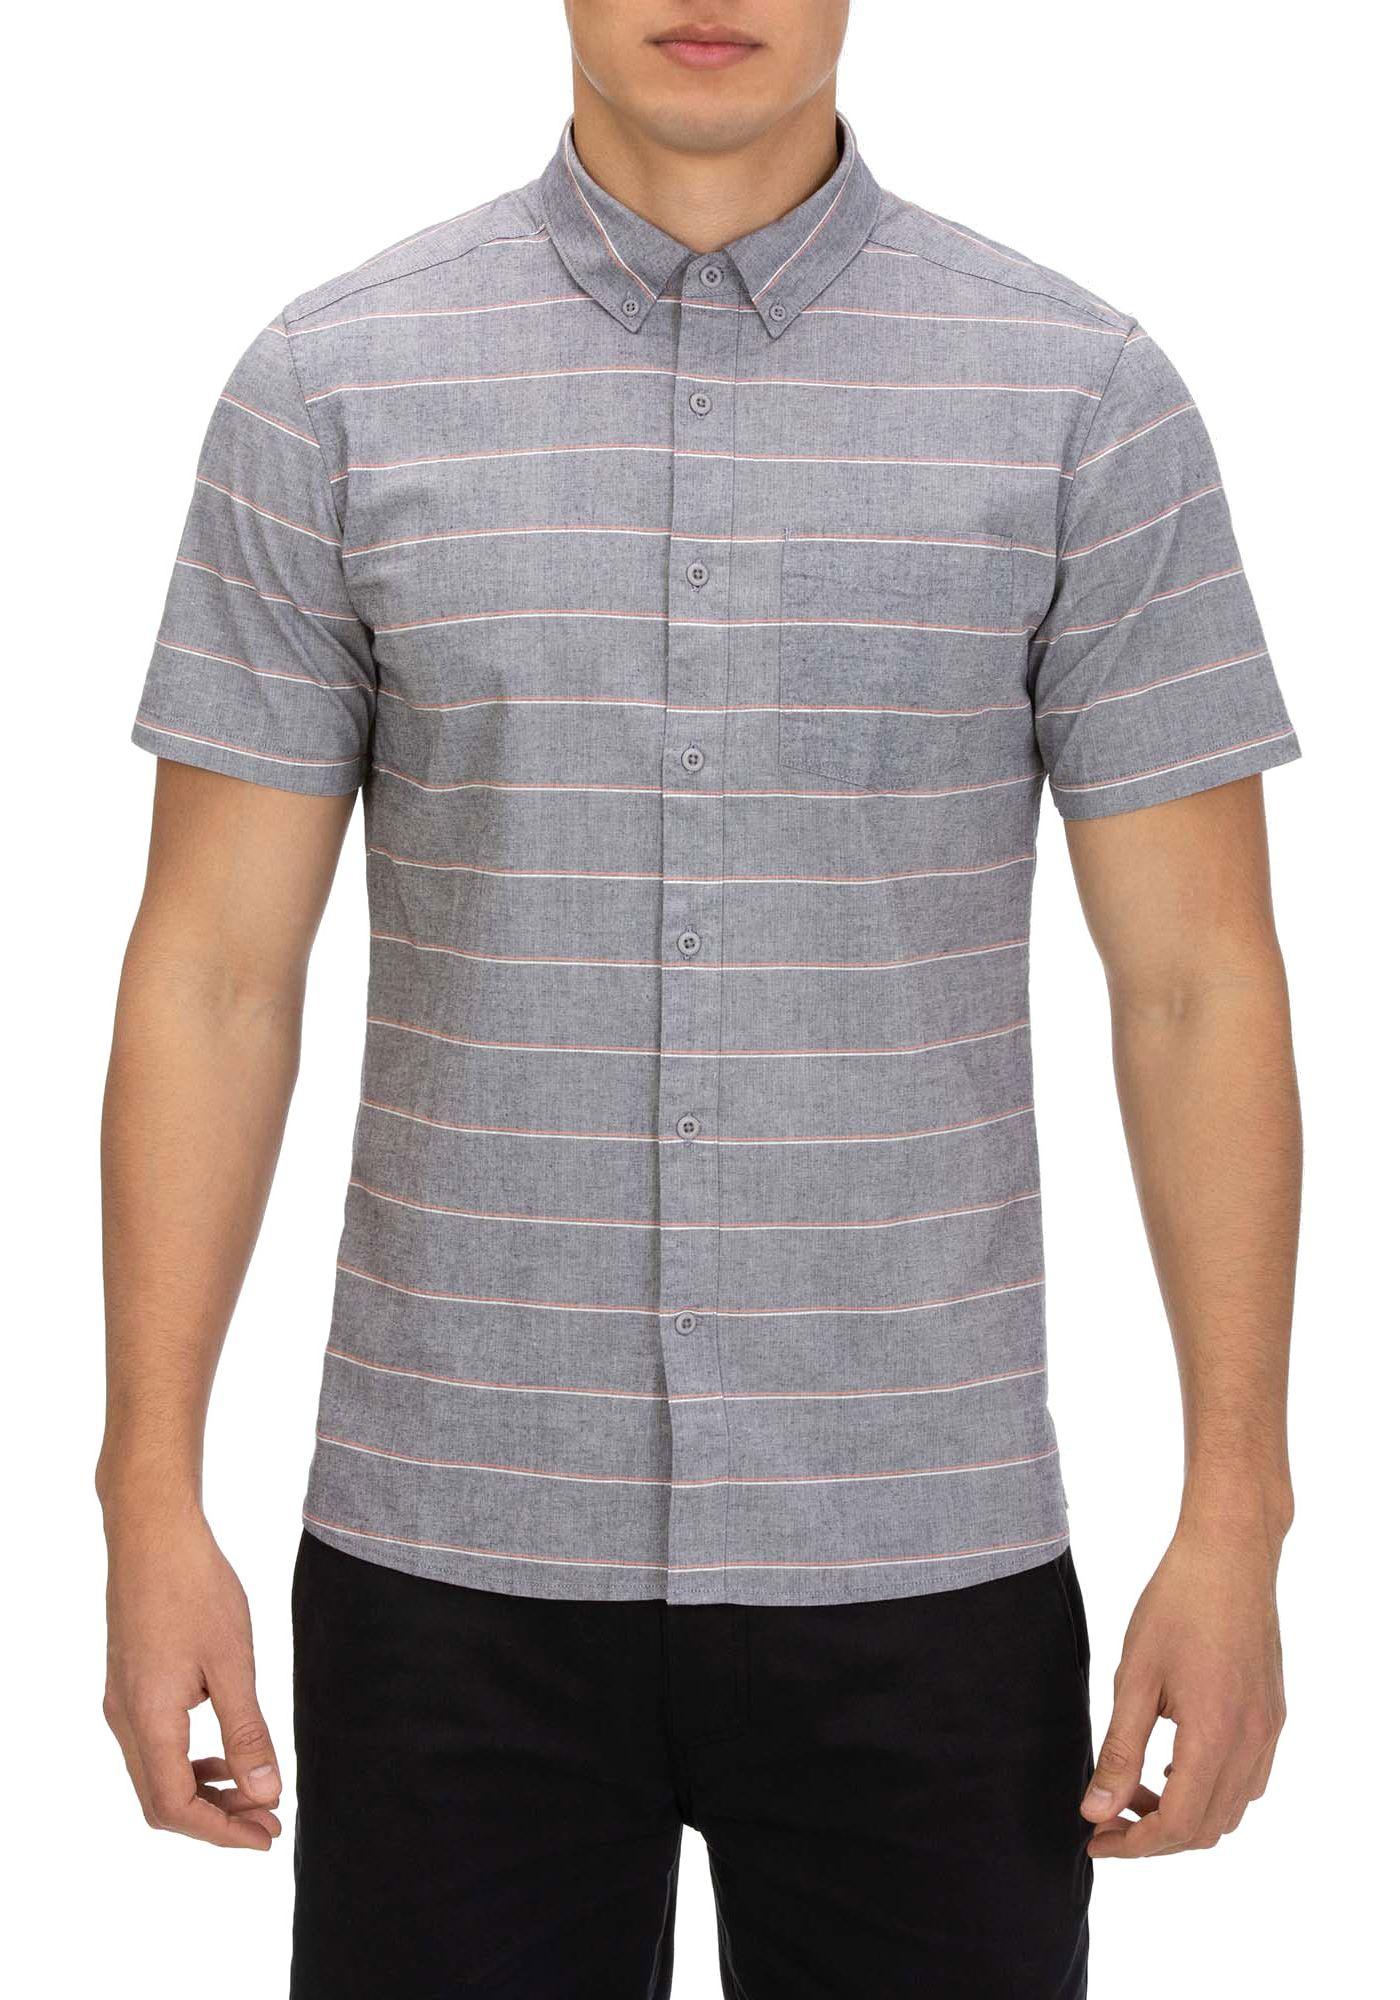 Hurley Men's Keanu Stripe Woven Short Sleeve Shirt